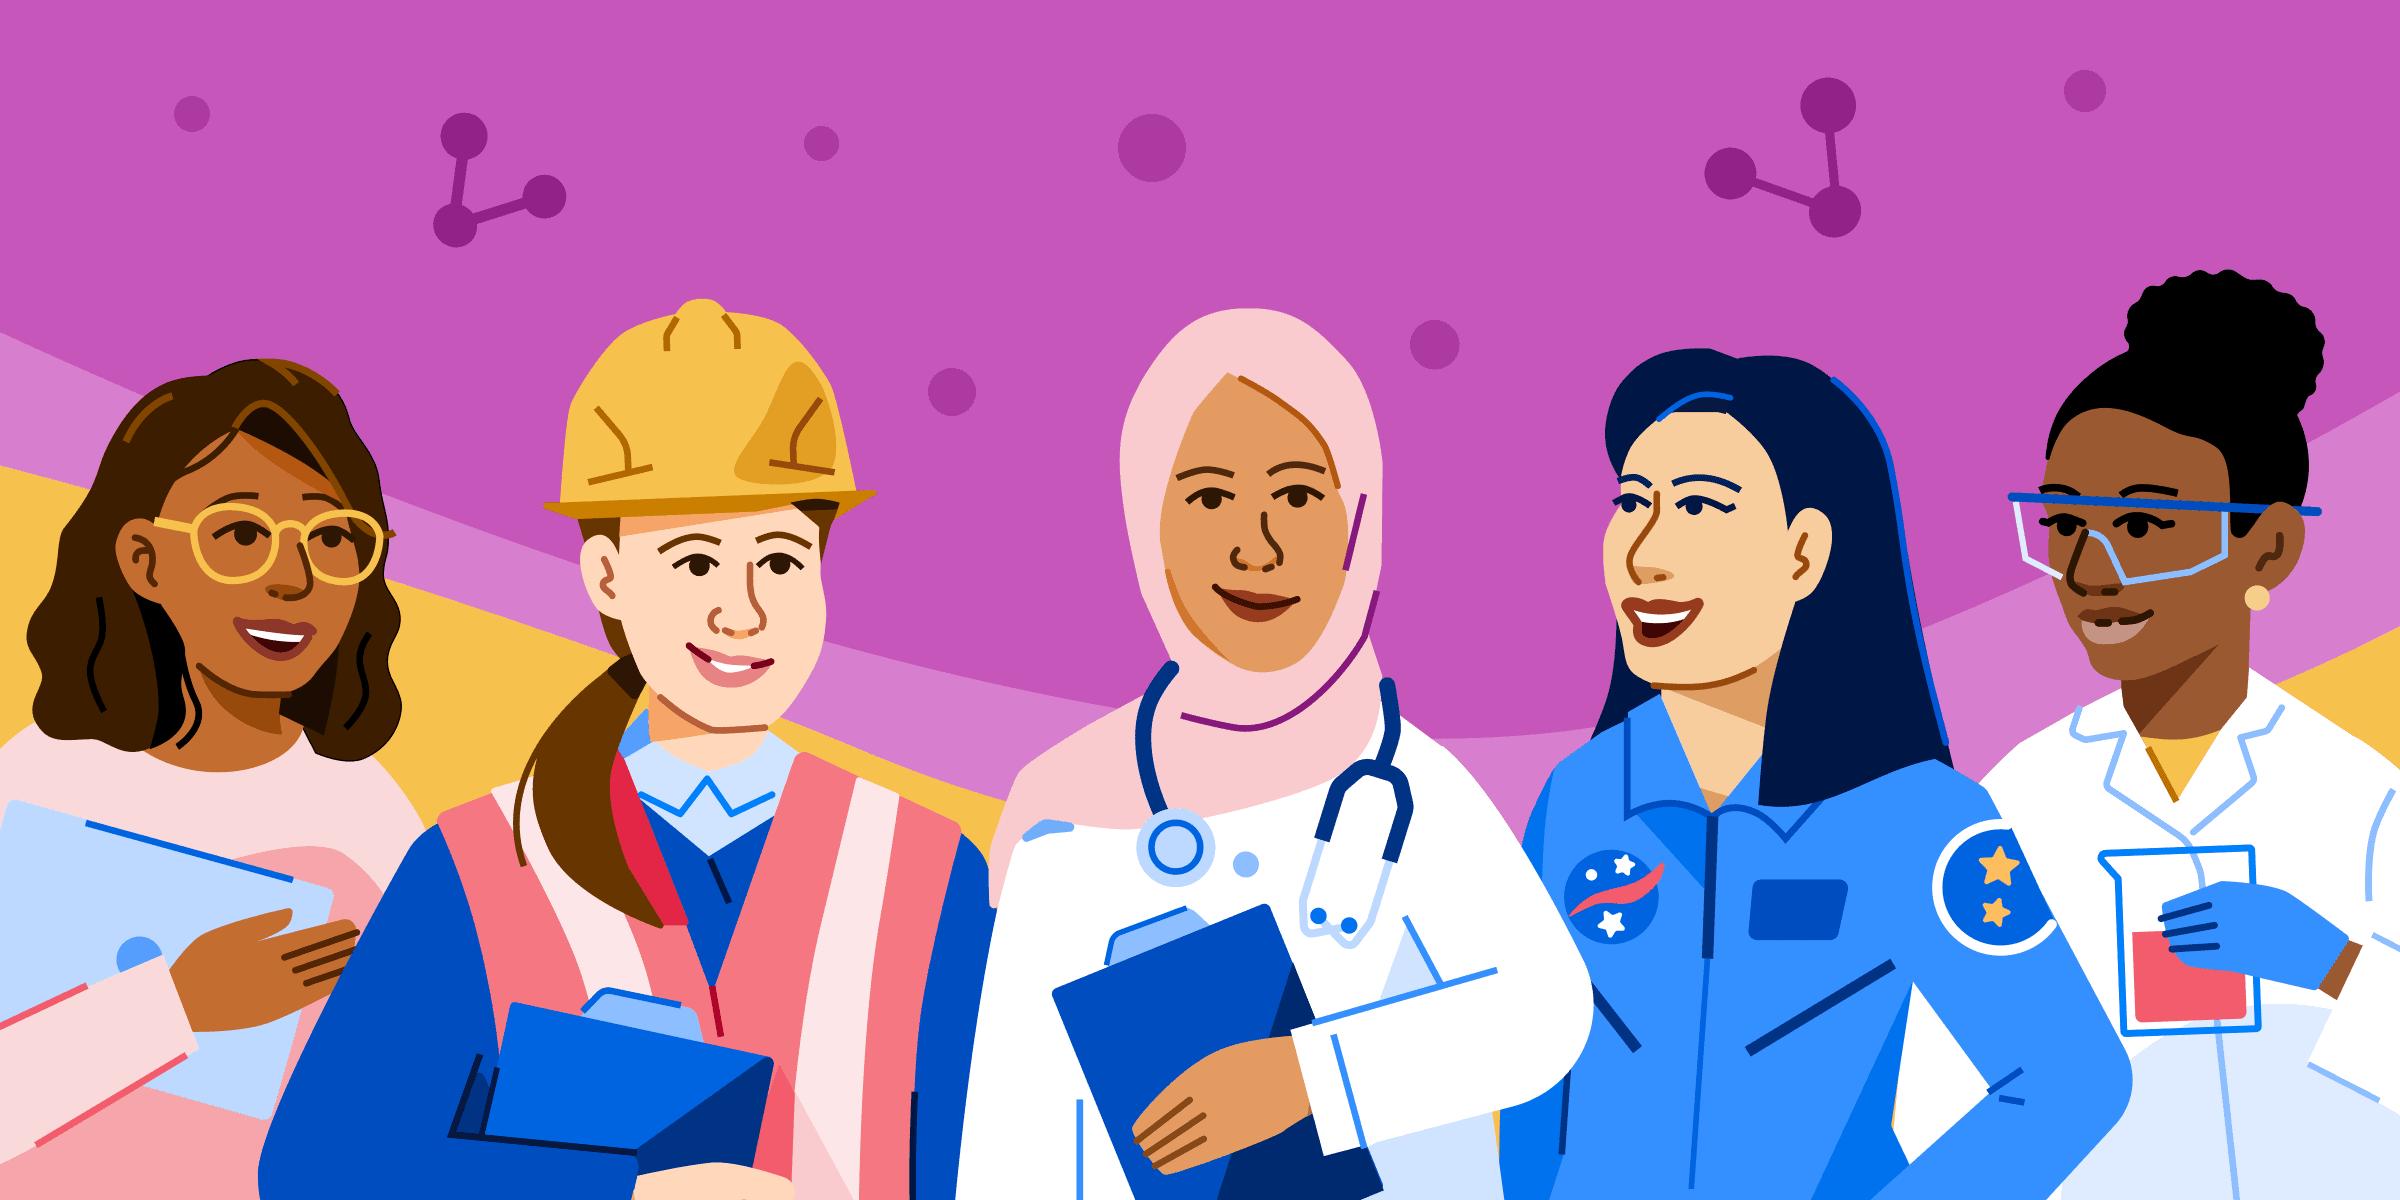 Illustration of women in STEM roles